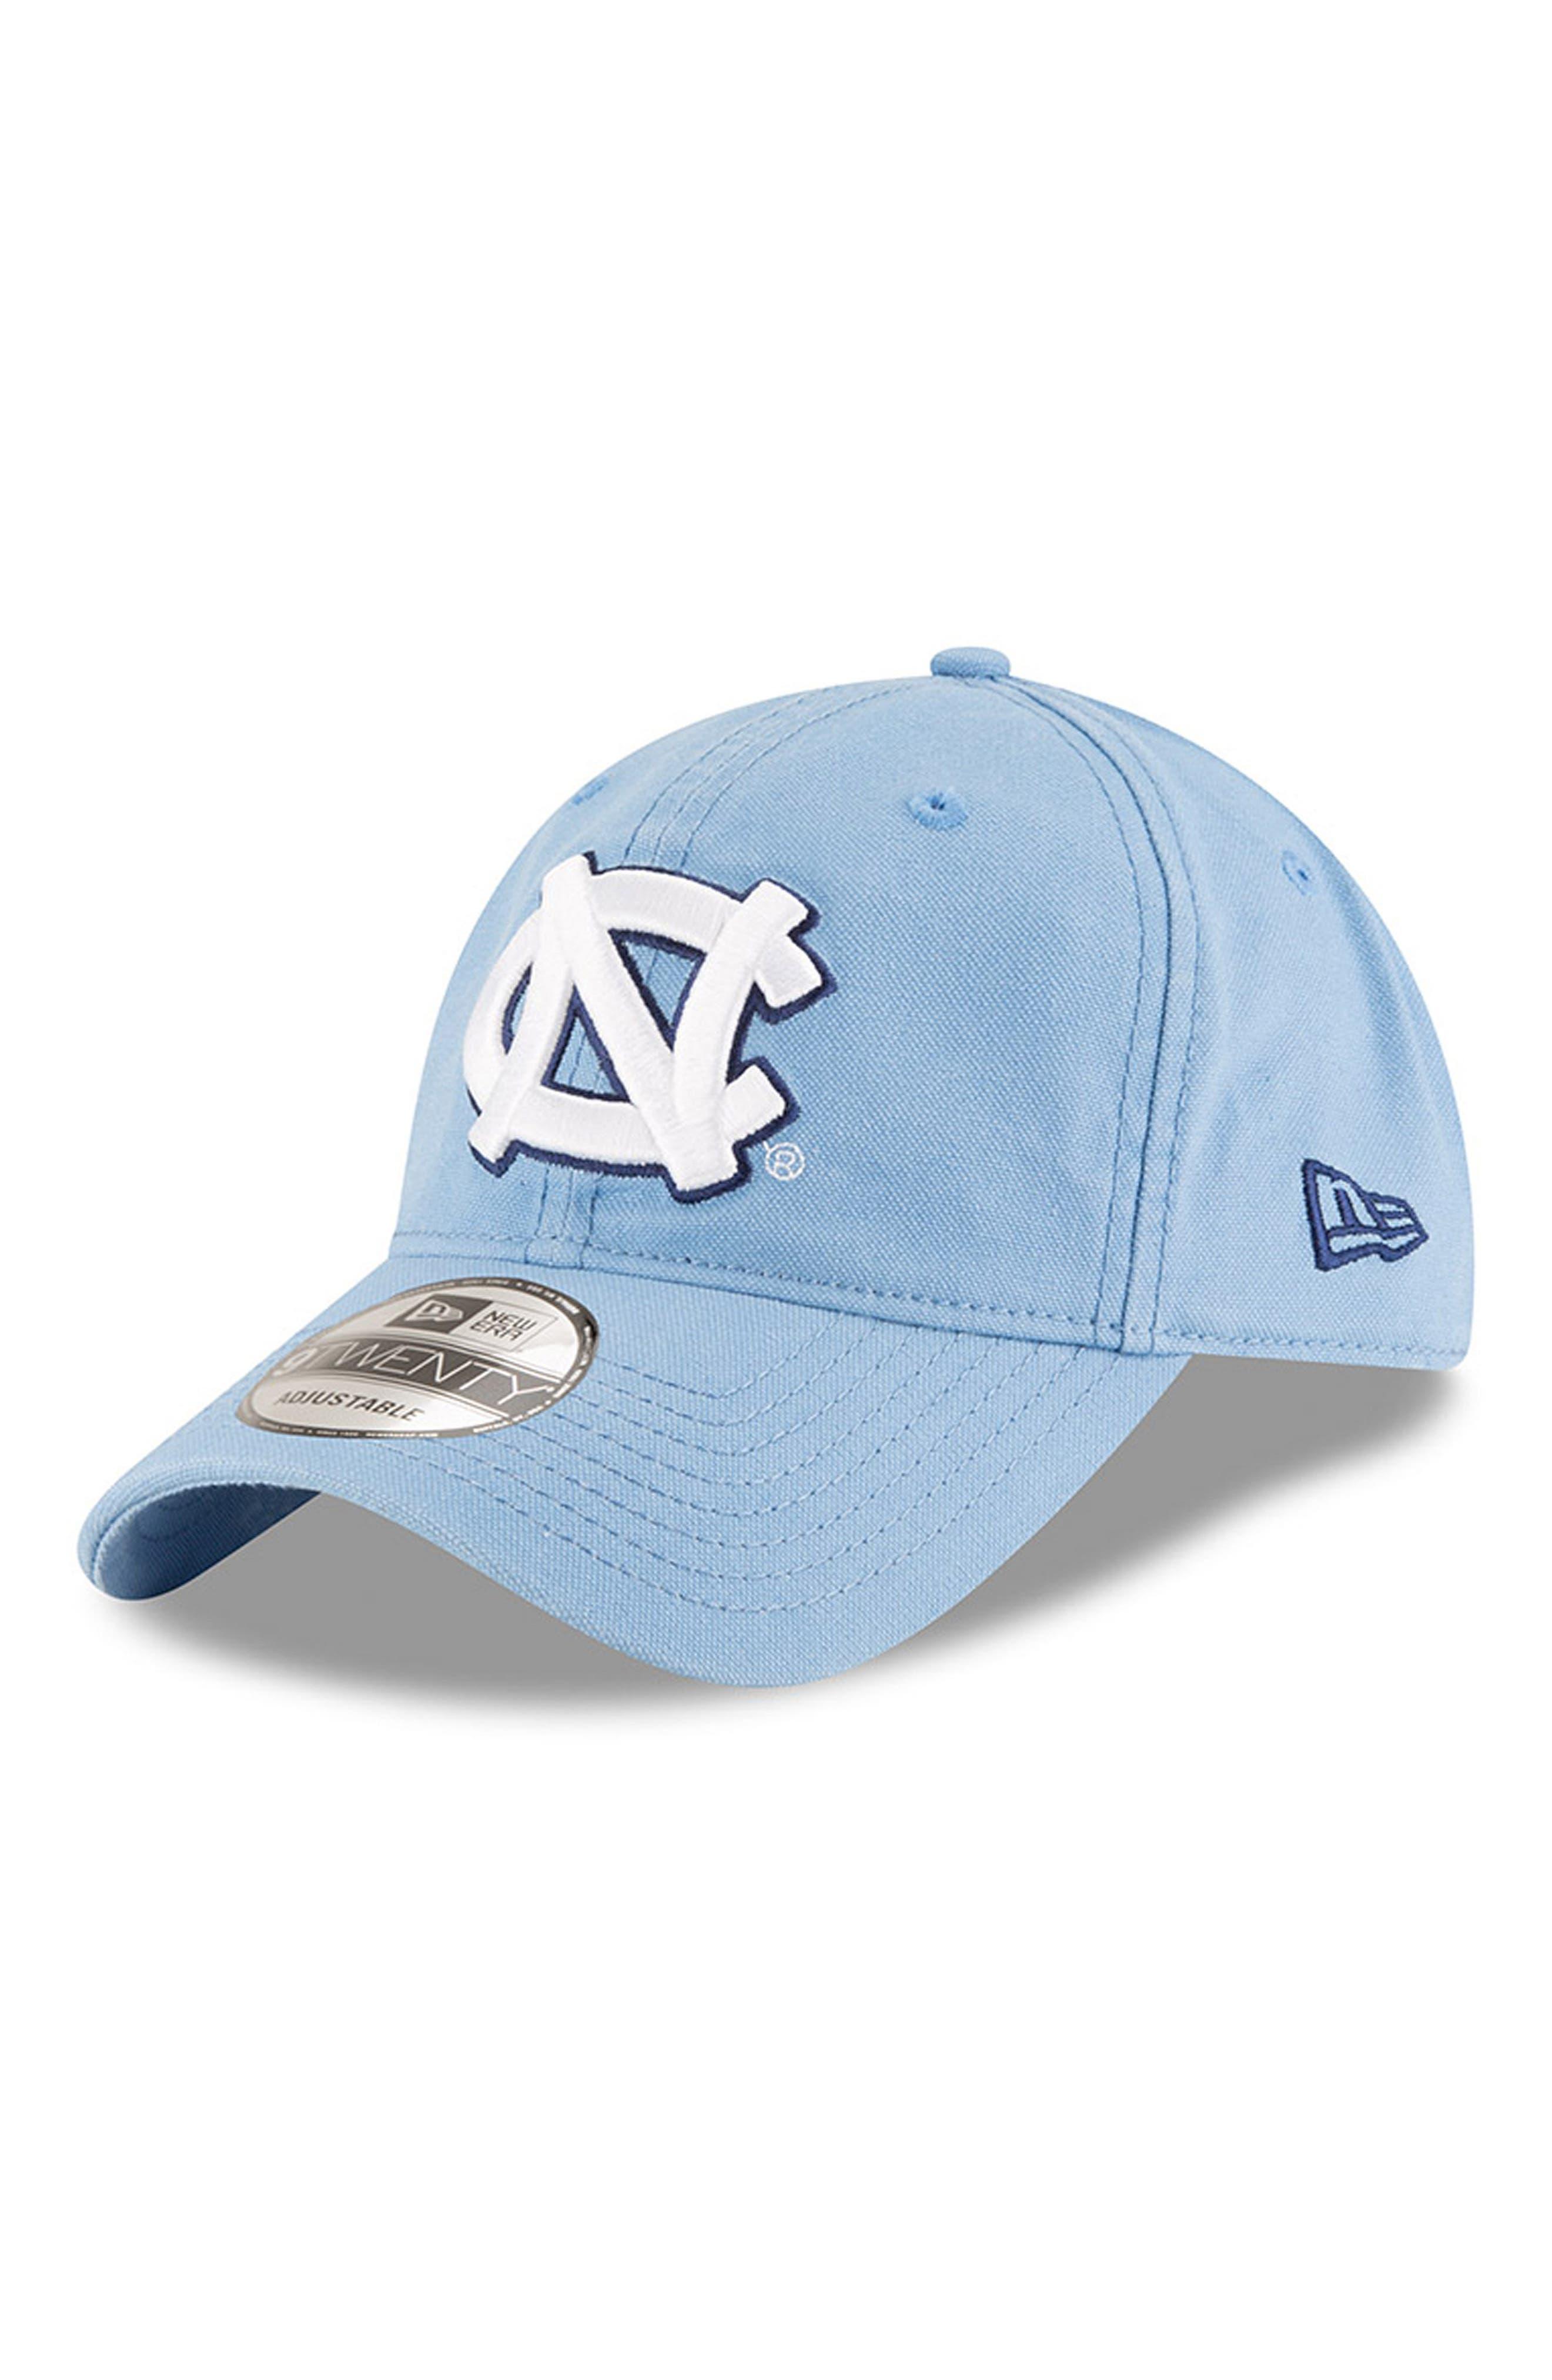 New Era Collegiate Core Classic - North Carolina Tar Heels Baseball Cap